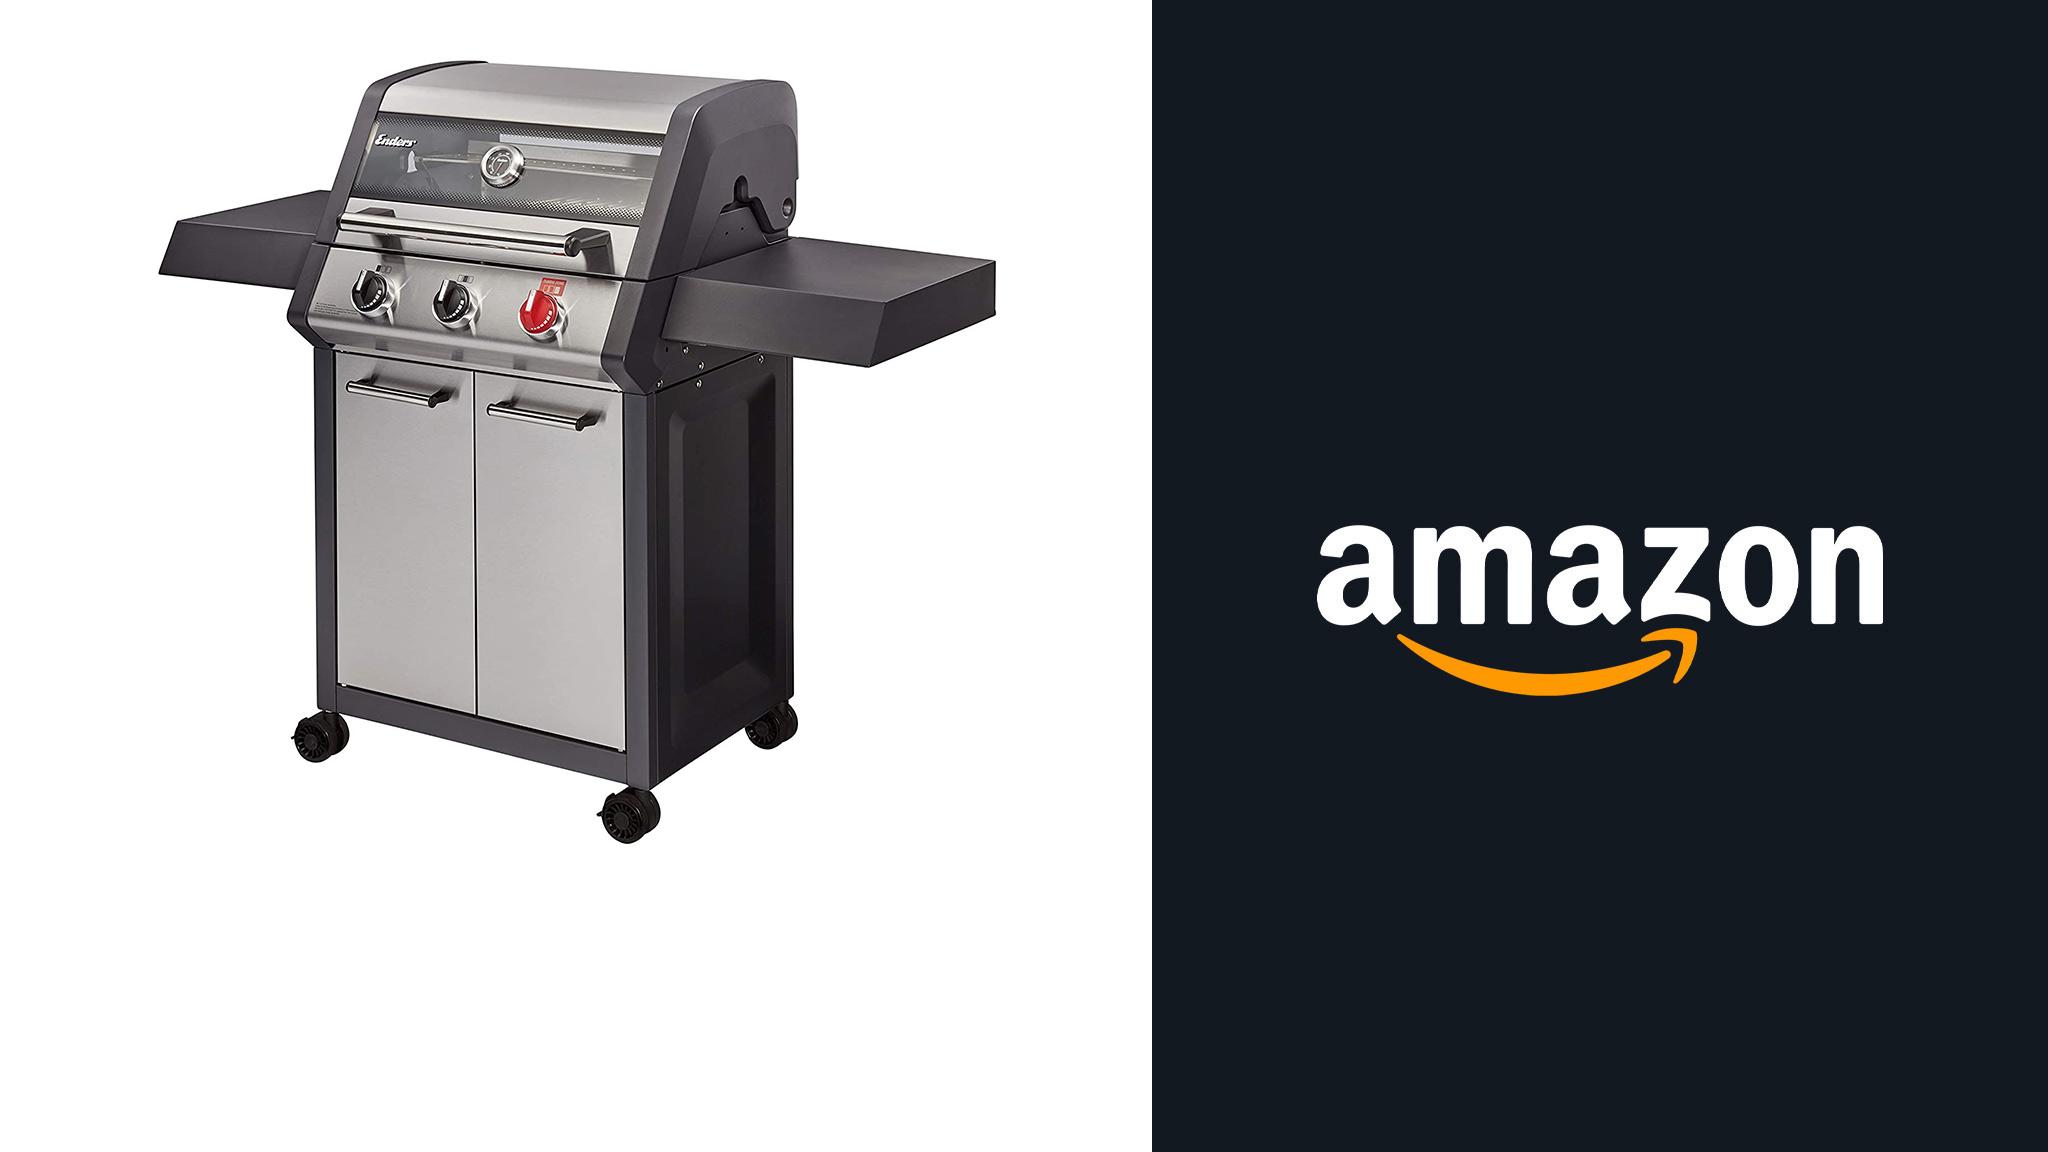 Amazon-Angebot: Enders-Gasgrill satte 30 Prozent reduziert!